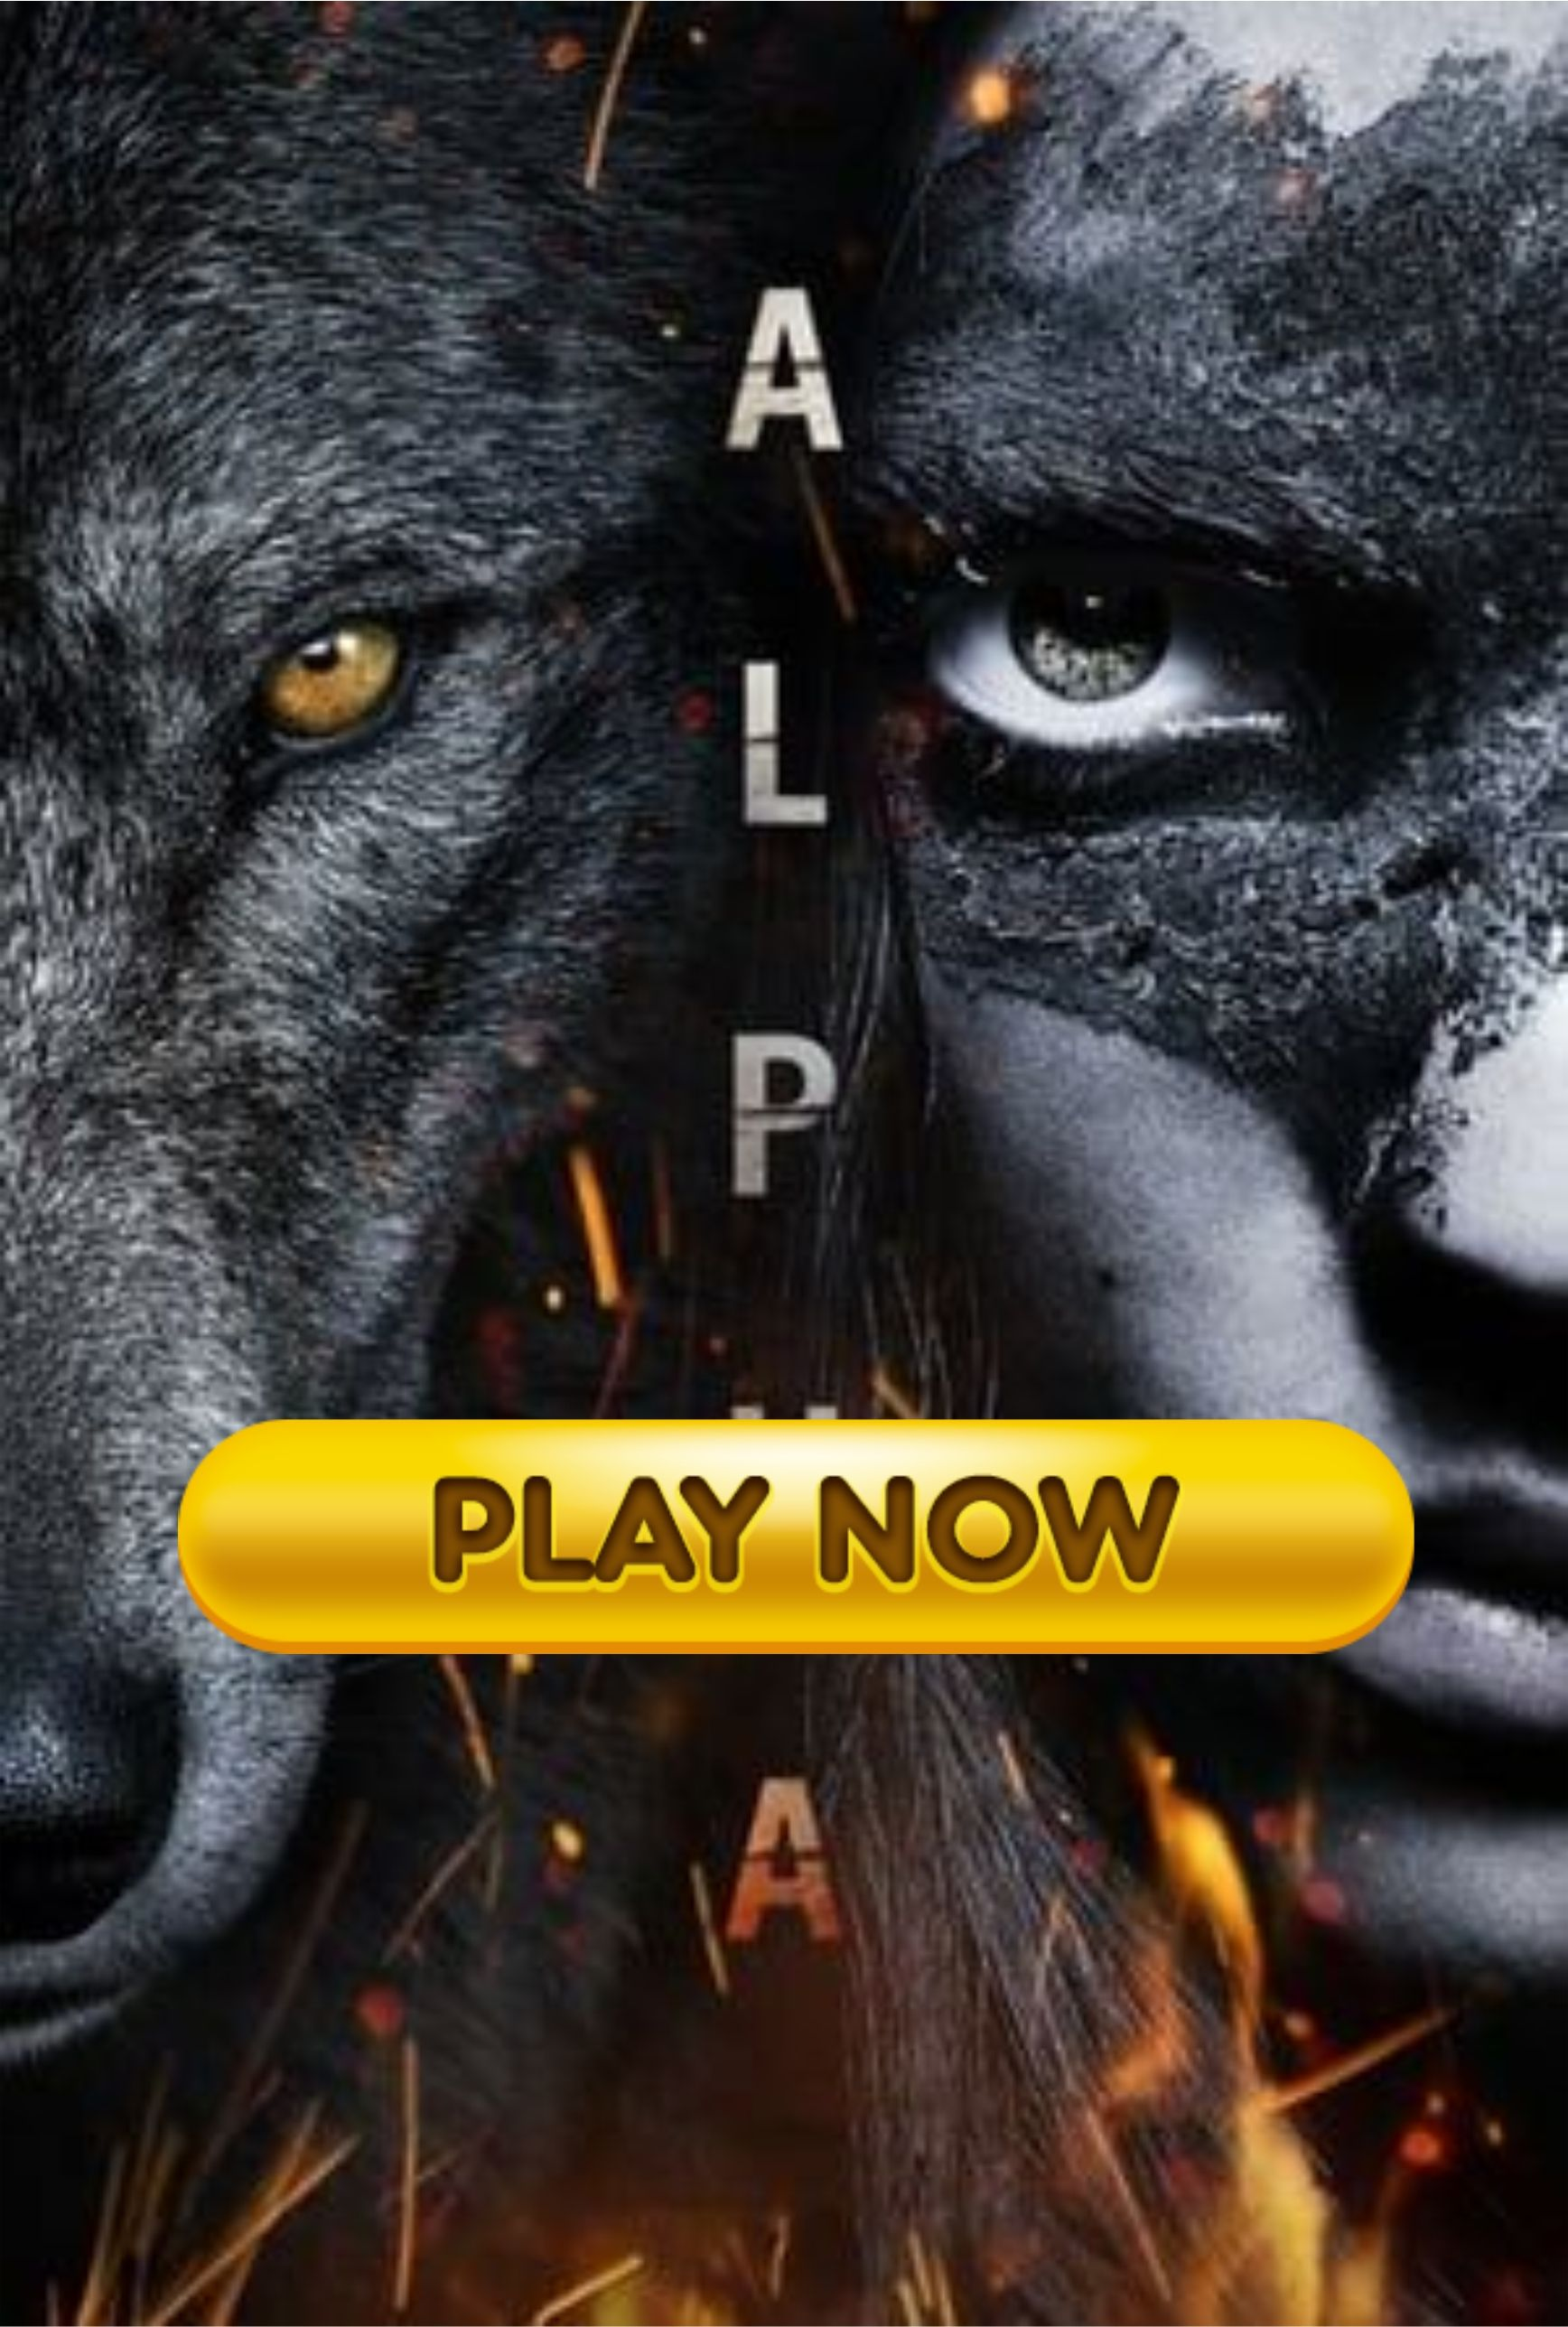 Ver Alpha 2018 Online Espanol Pelicula Hd Completa Full Movies Alpha Movies